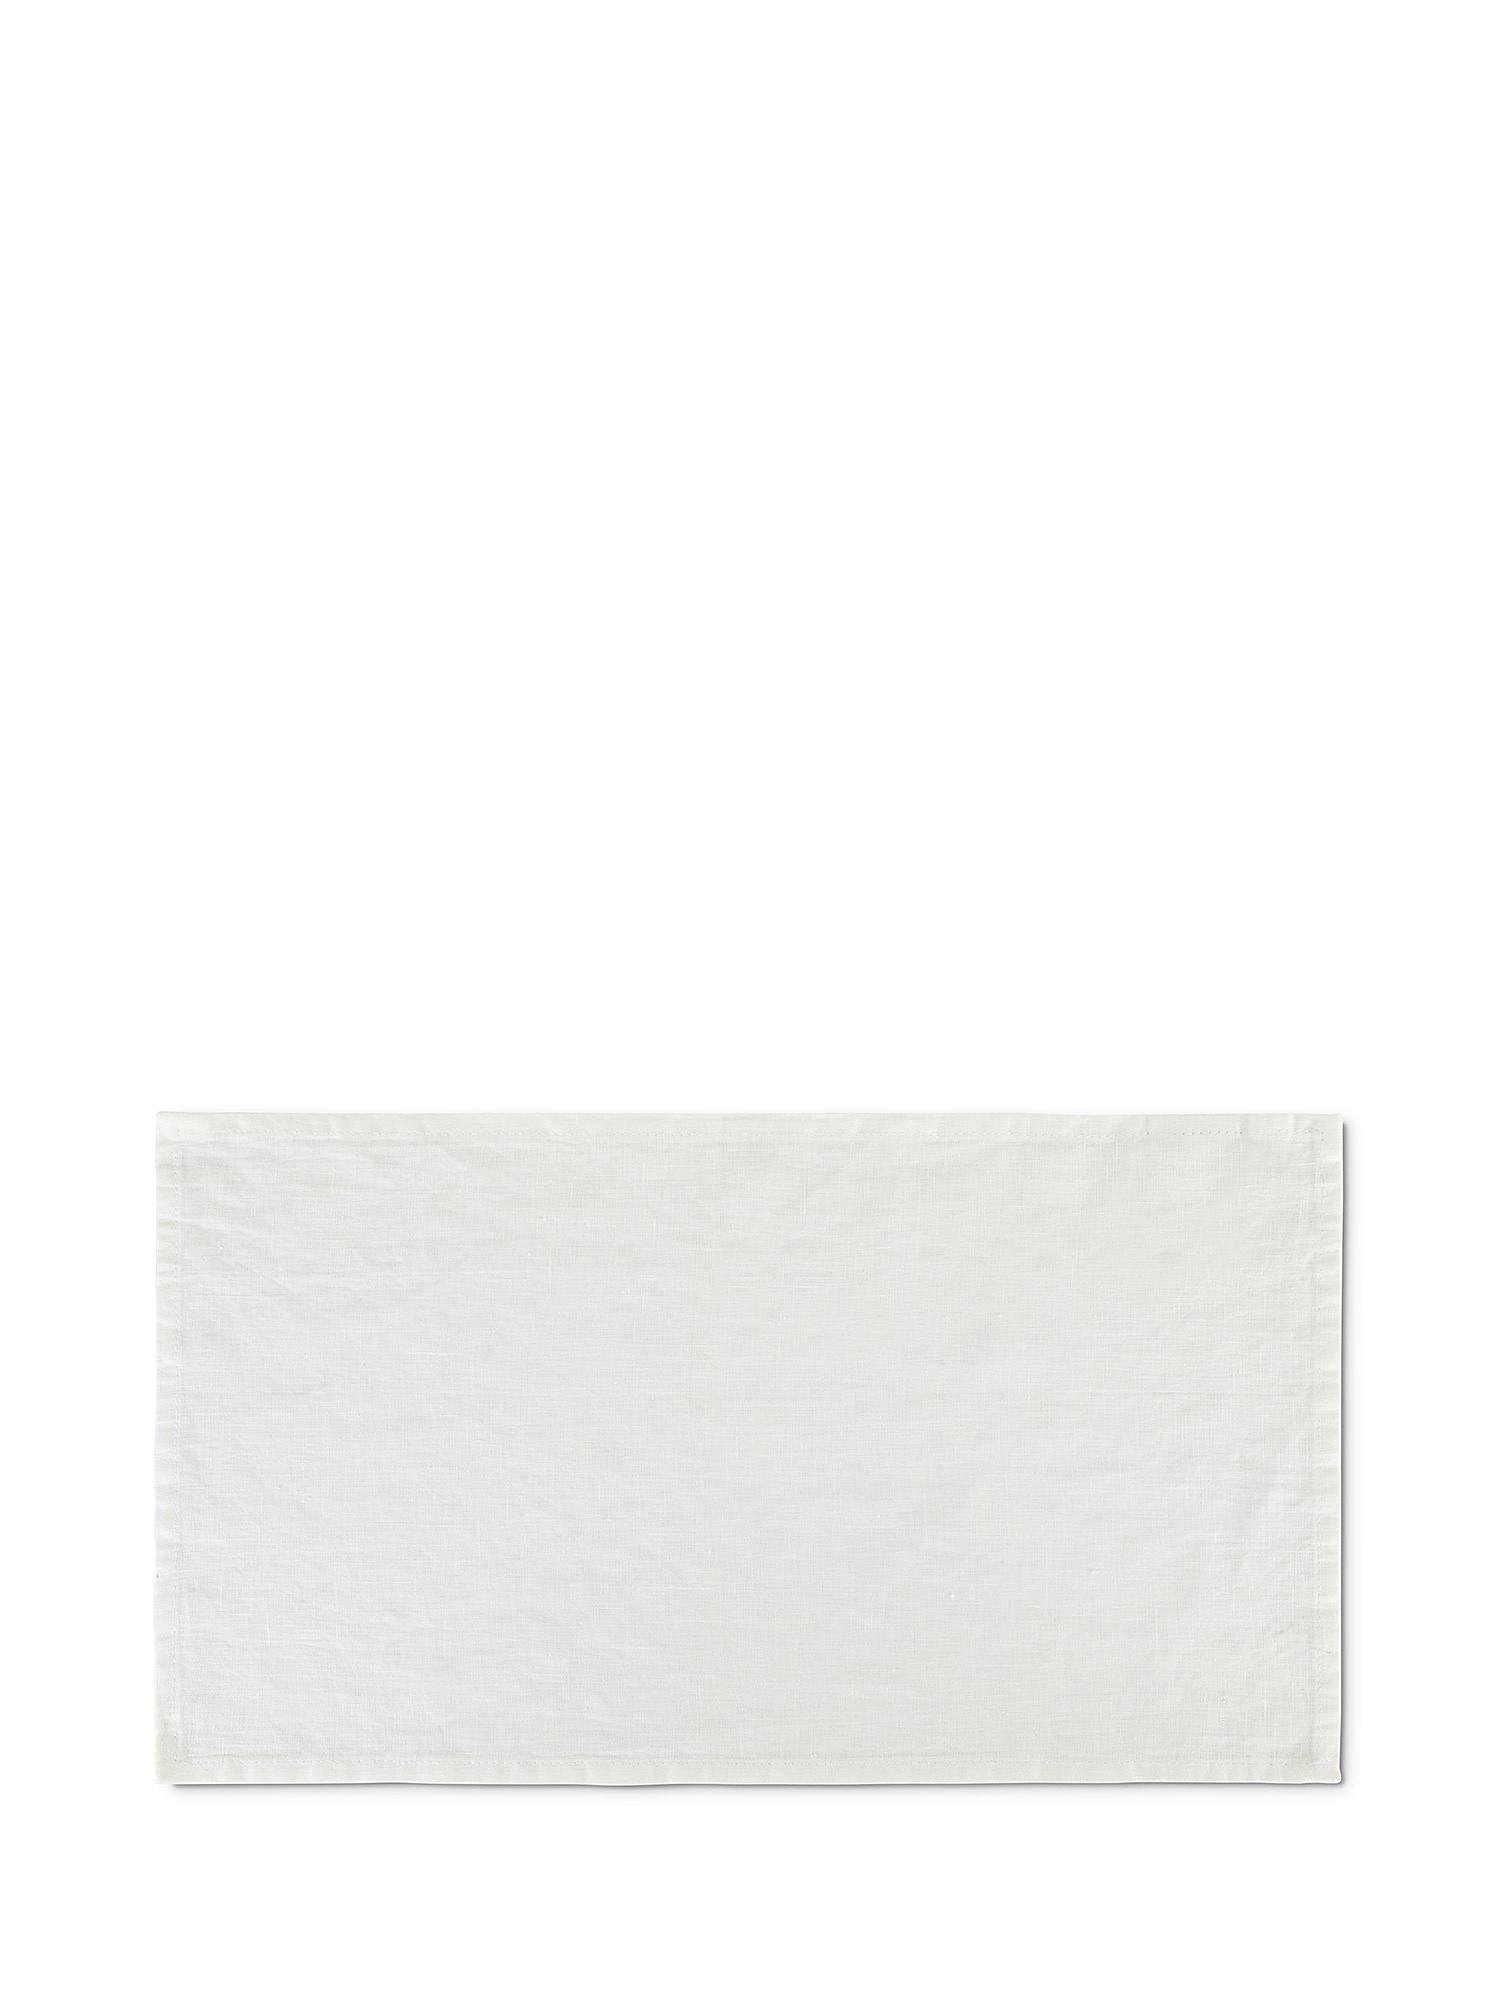 Tovaglietta lino lavato tinta unita, Bianco, large image number 0